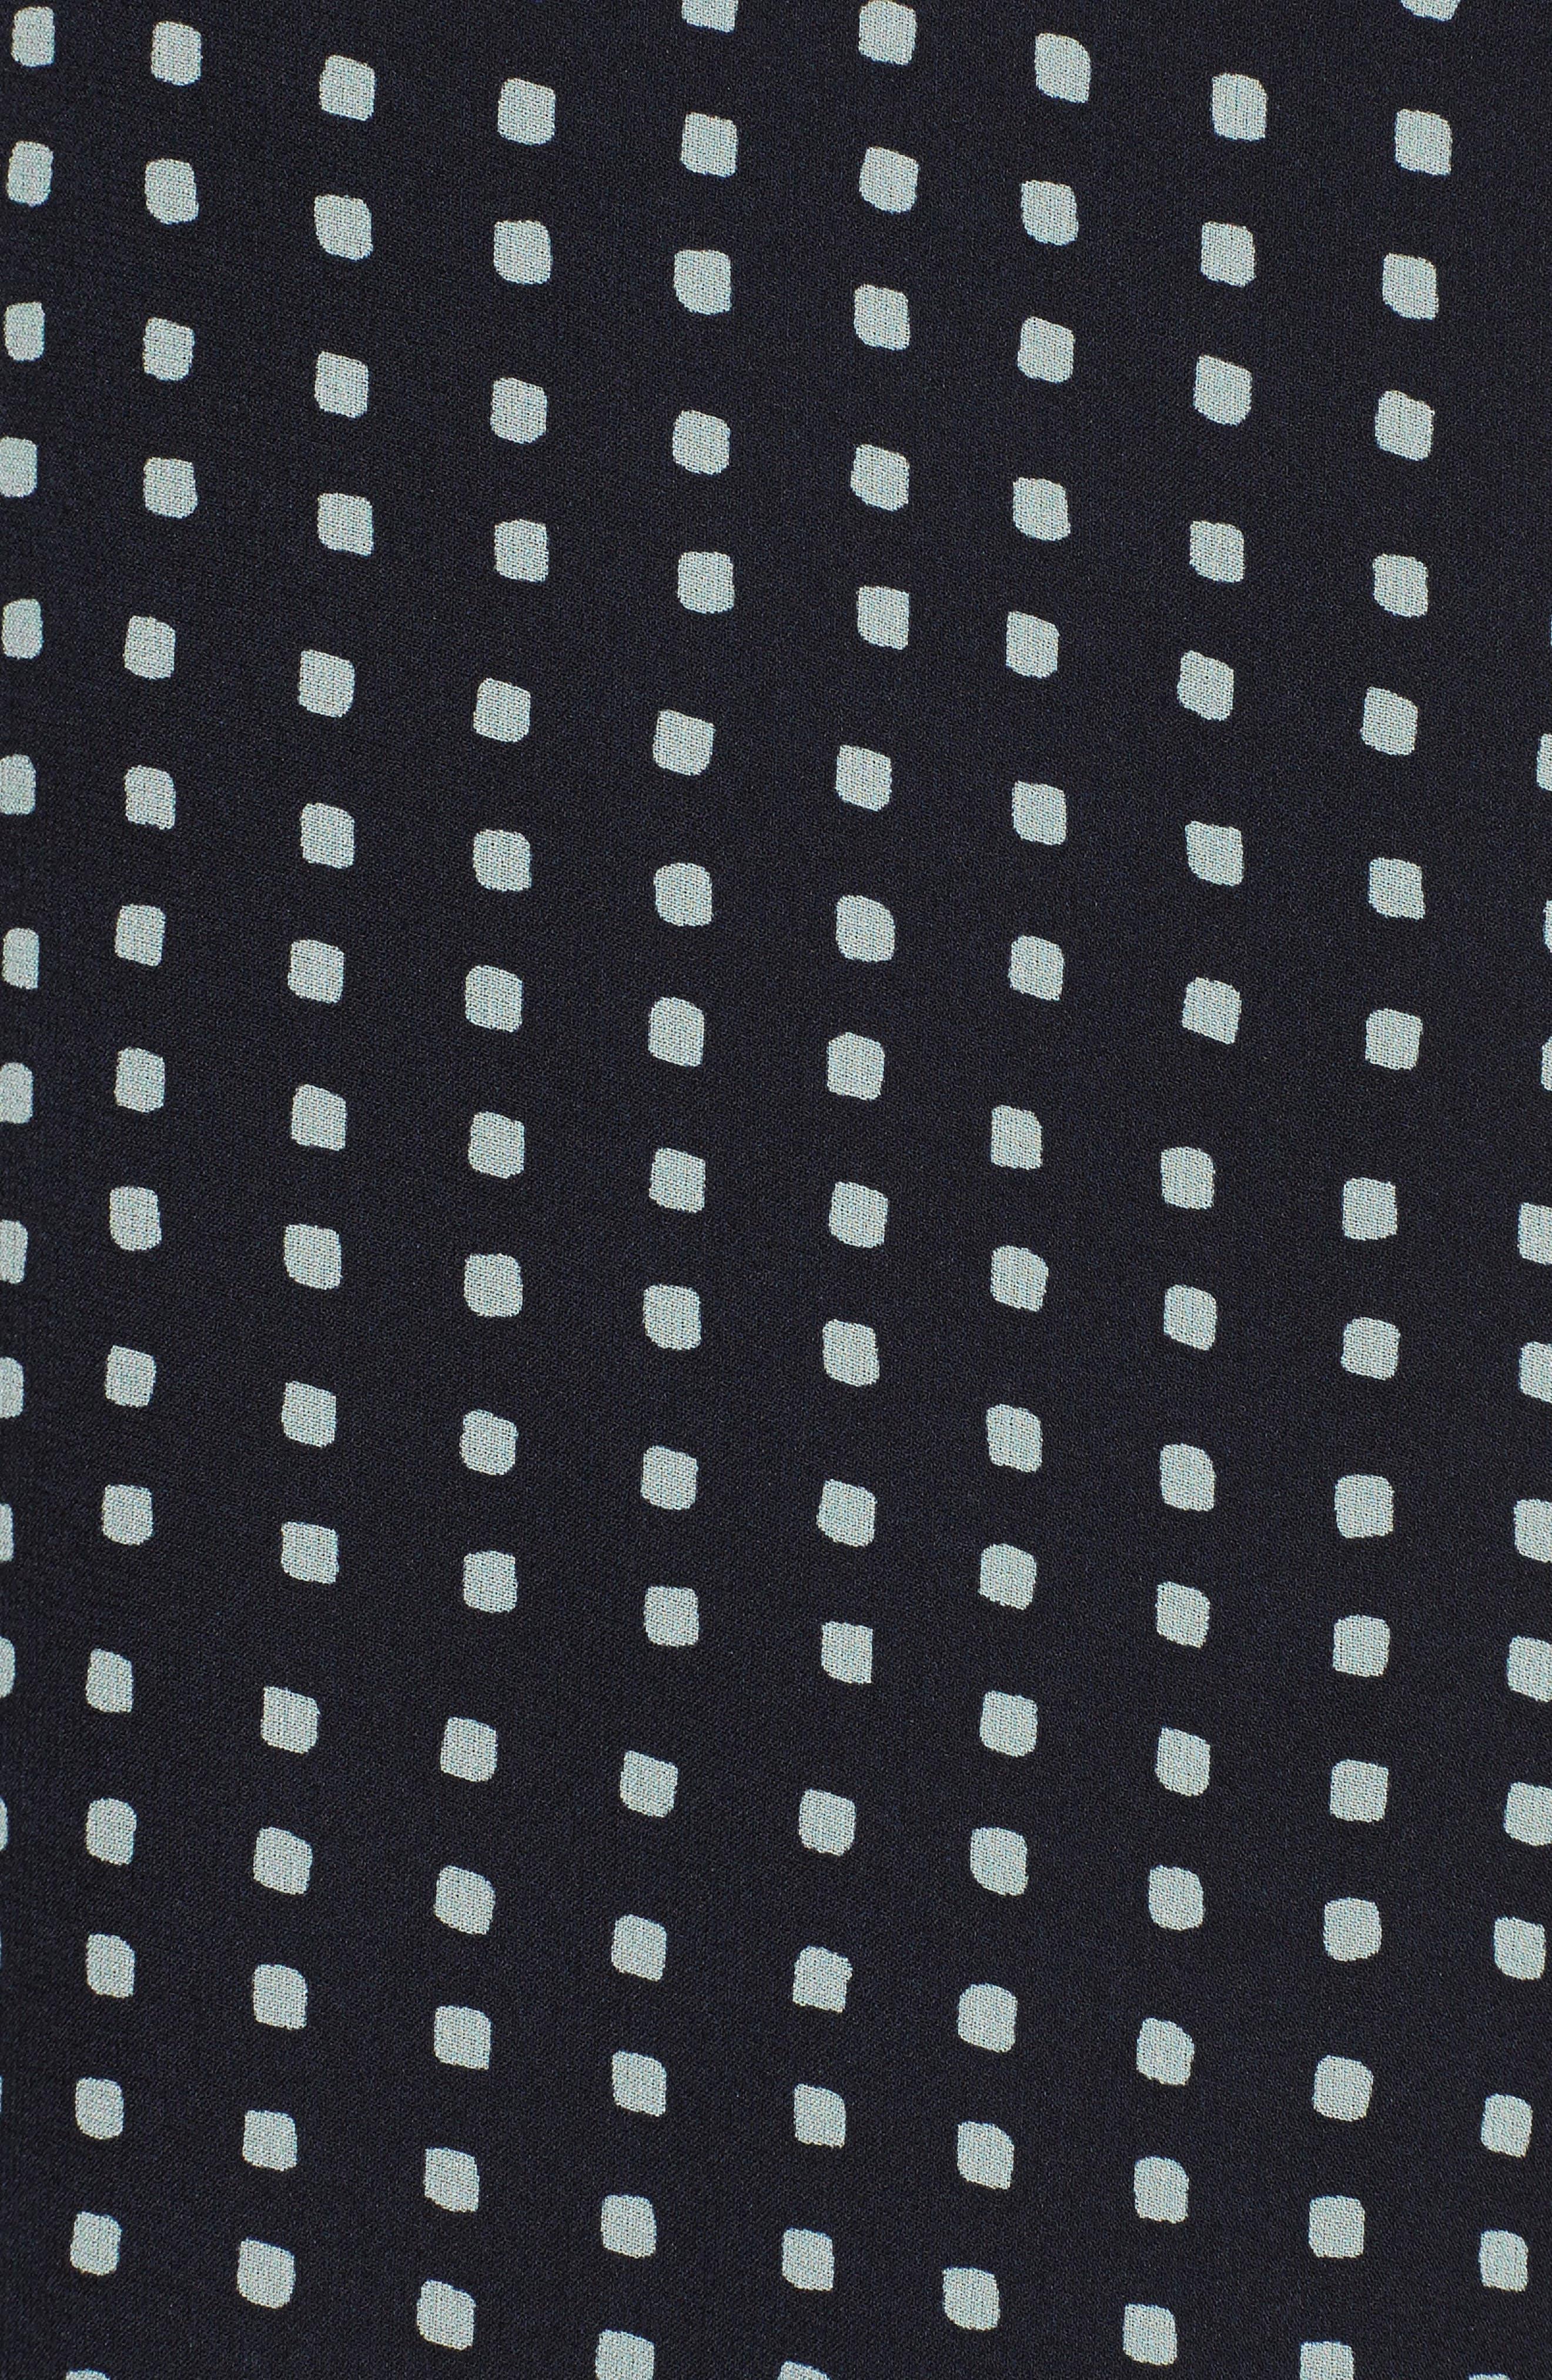 Sunaya Square Silk Chiffon Shirt,                             Alternate thumbnail 5, color,                             Deep Navy Multi